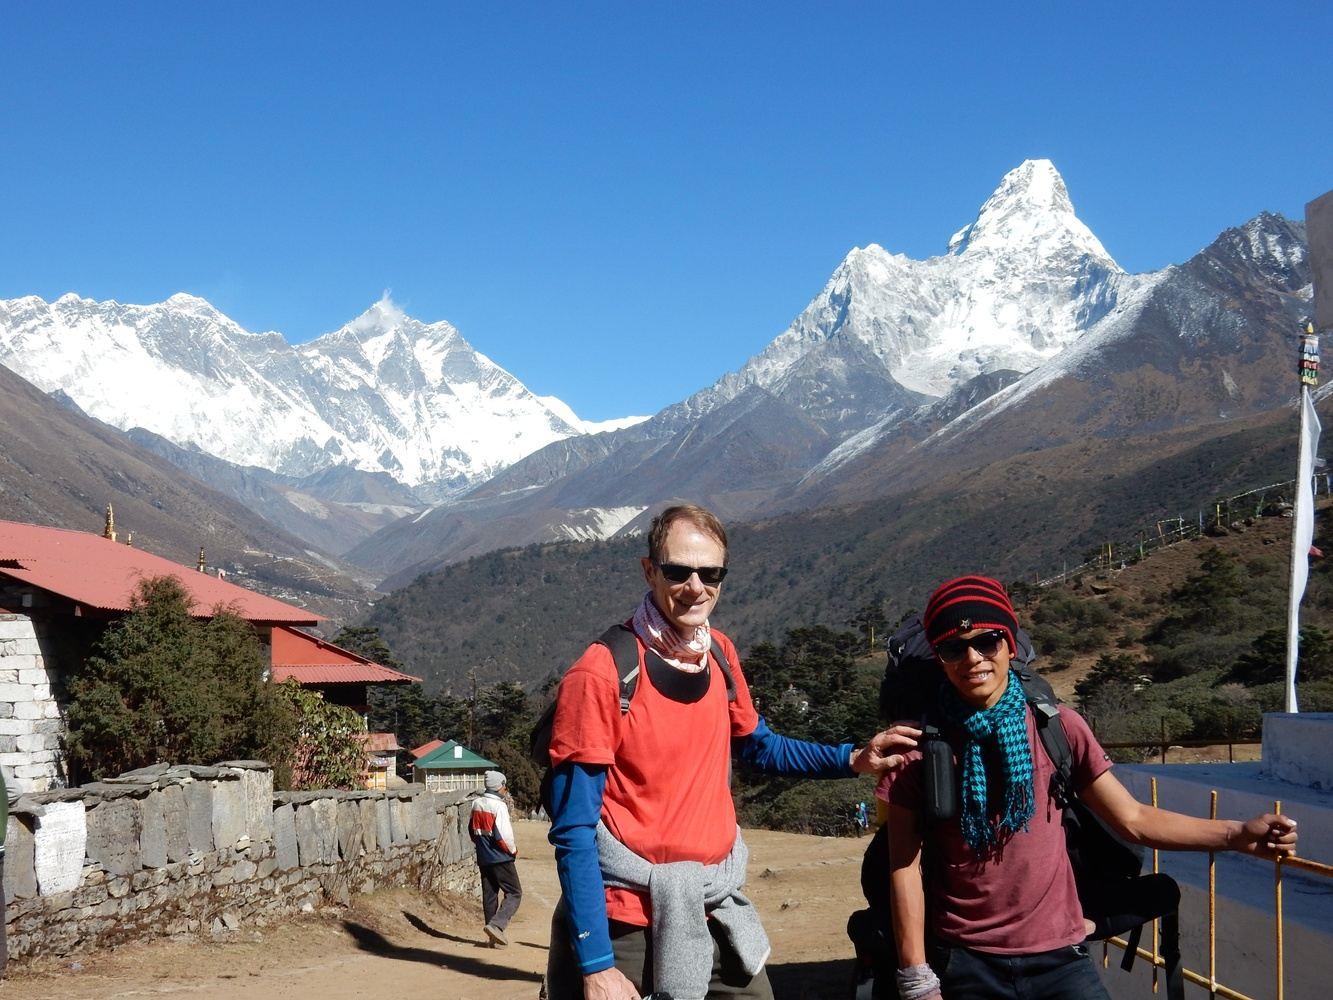 Everest Base Camp Trekking in Nepal